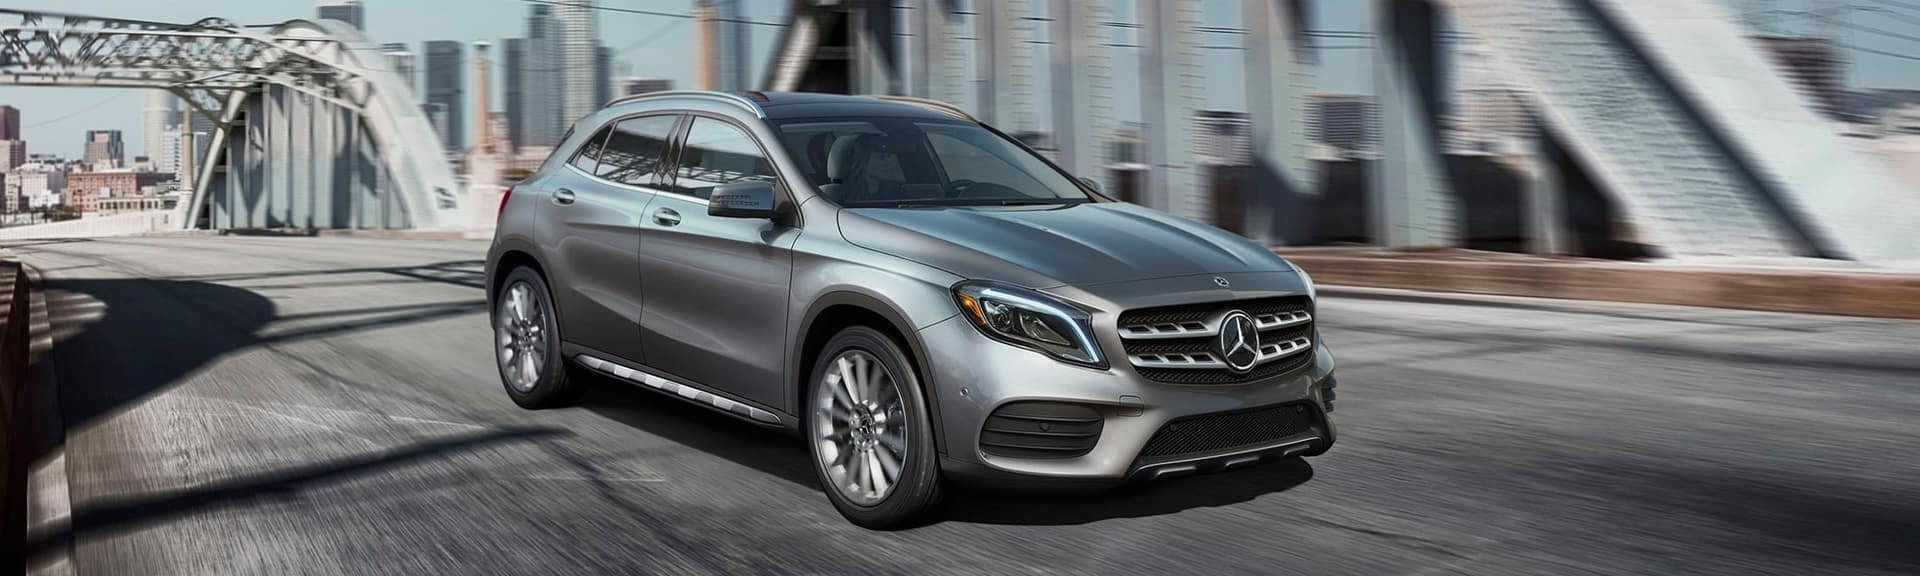 2020 Mercedes-Benz GLA SUV